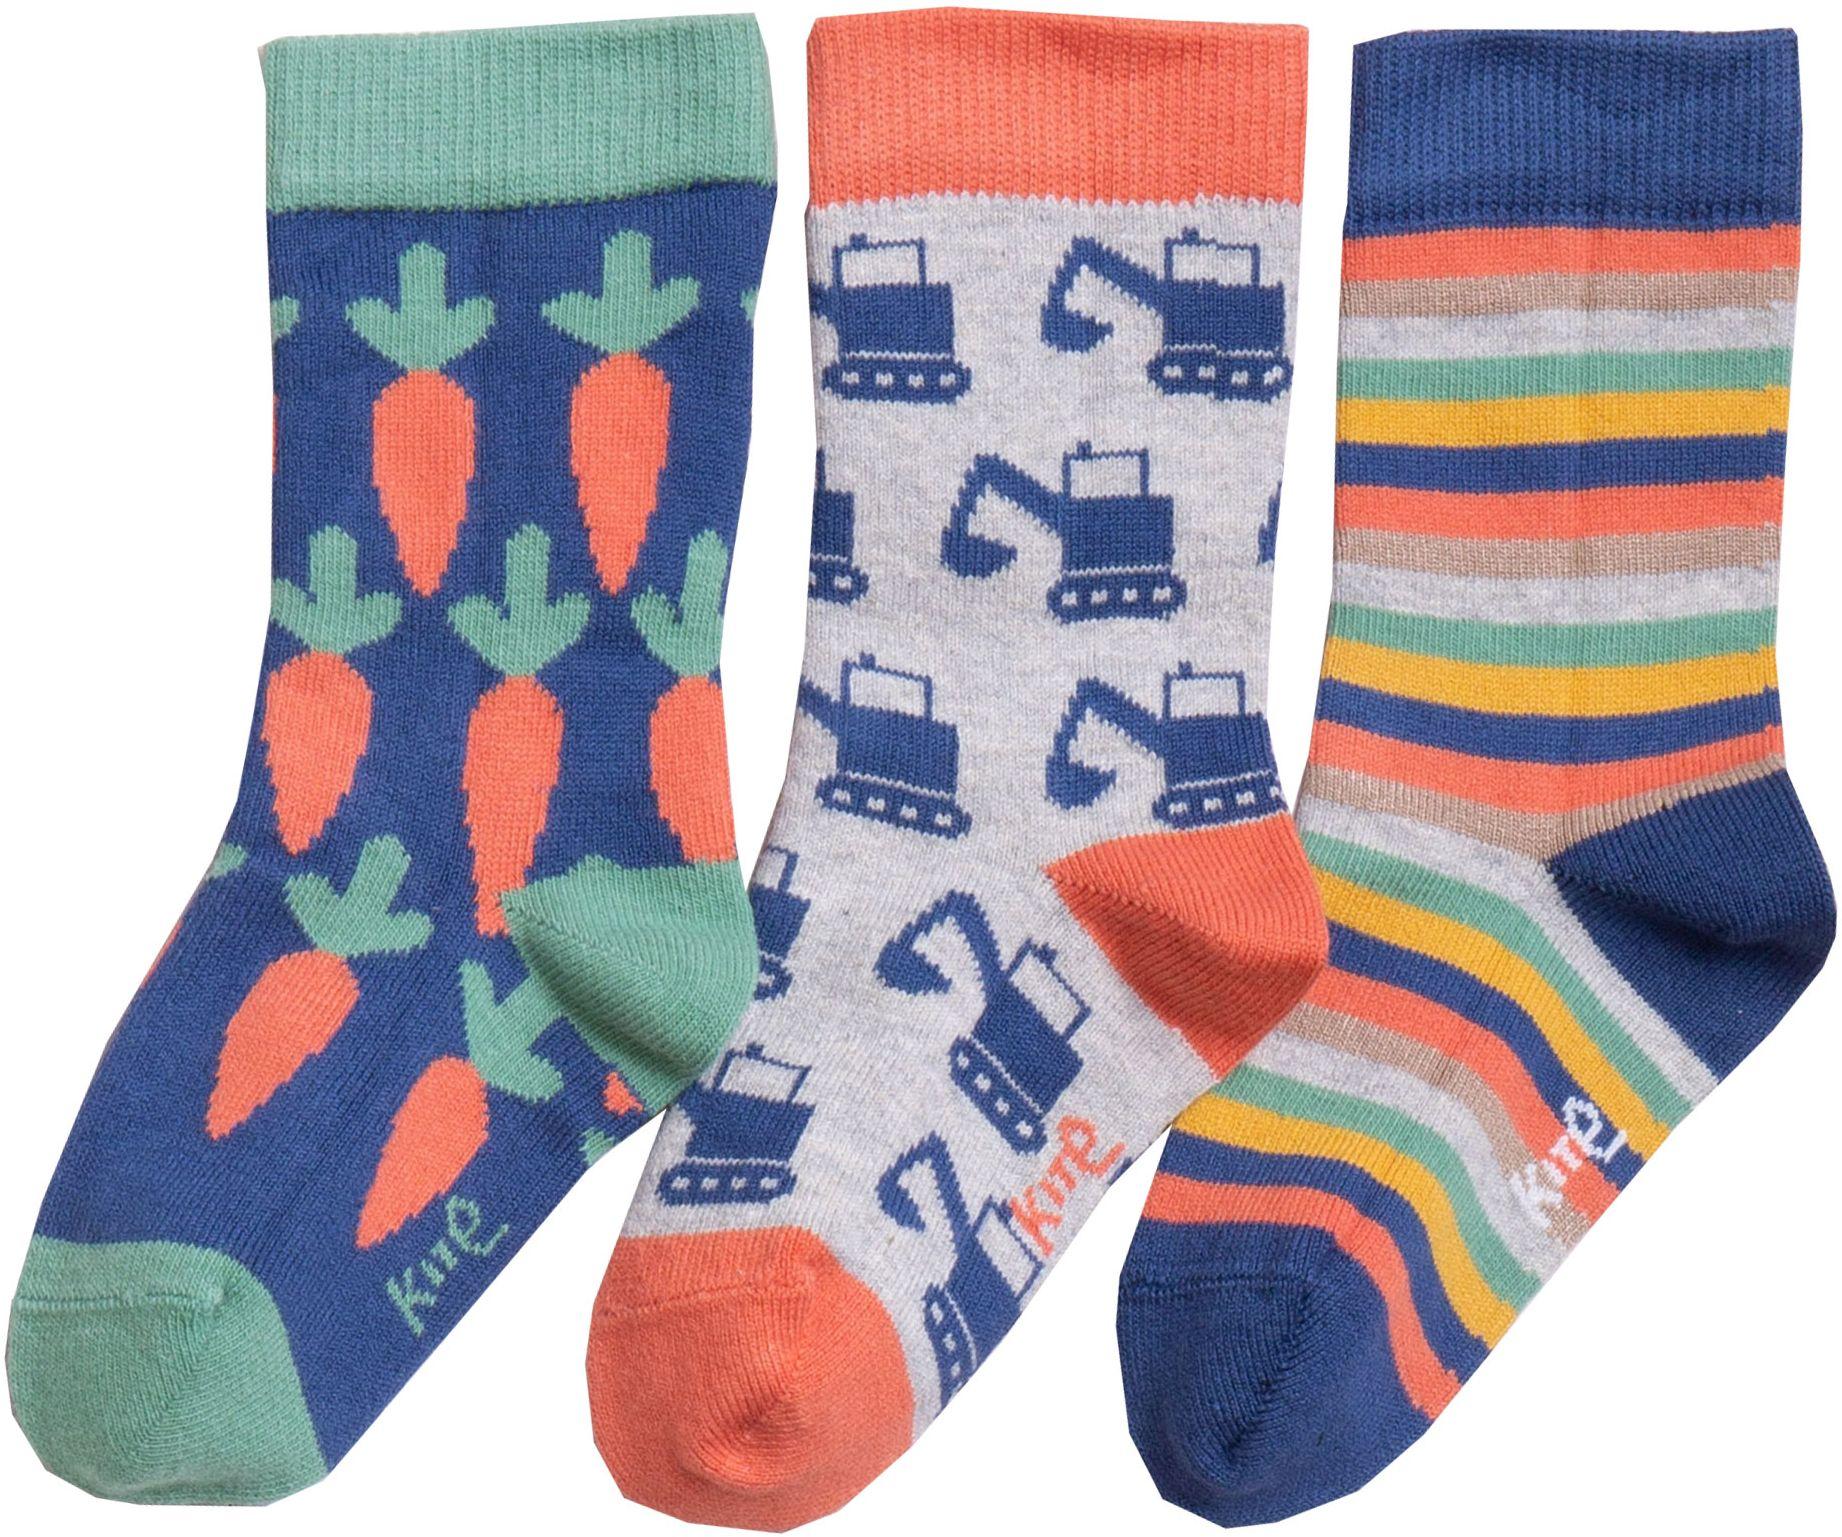 Gemusterte Kinder-Socken im 3er-Pack mit Baggern